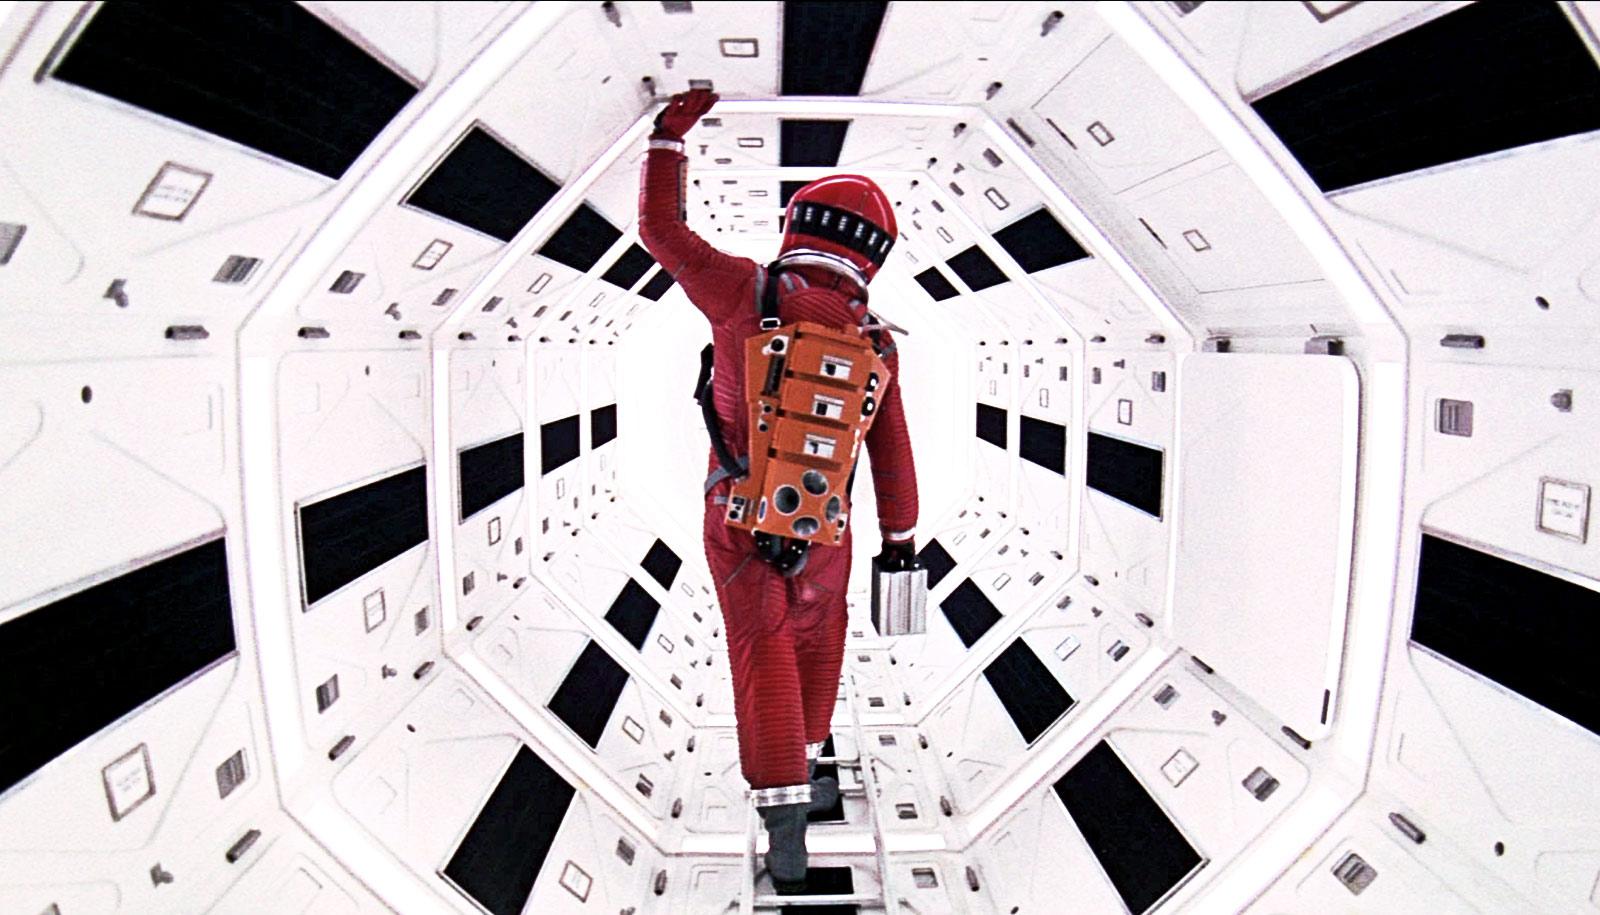 2001 A Space Odyssey - Stanley Kubrick - Legowelt